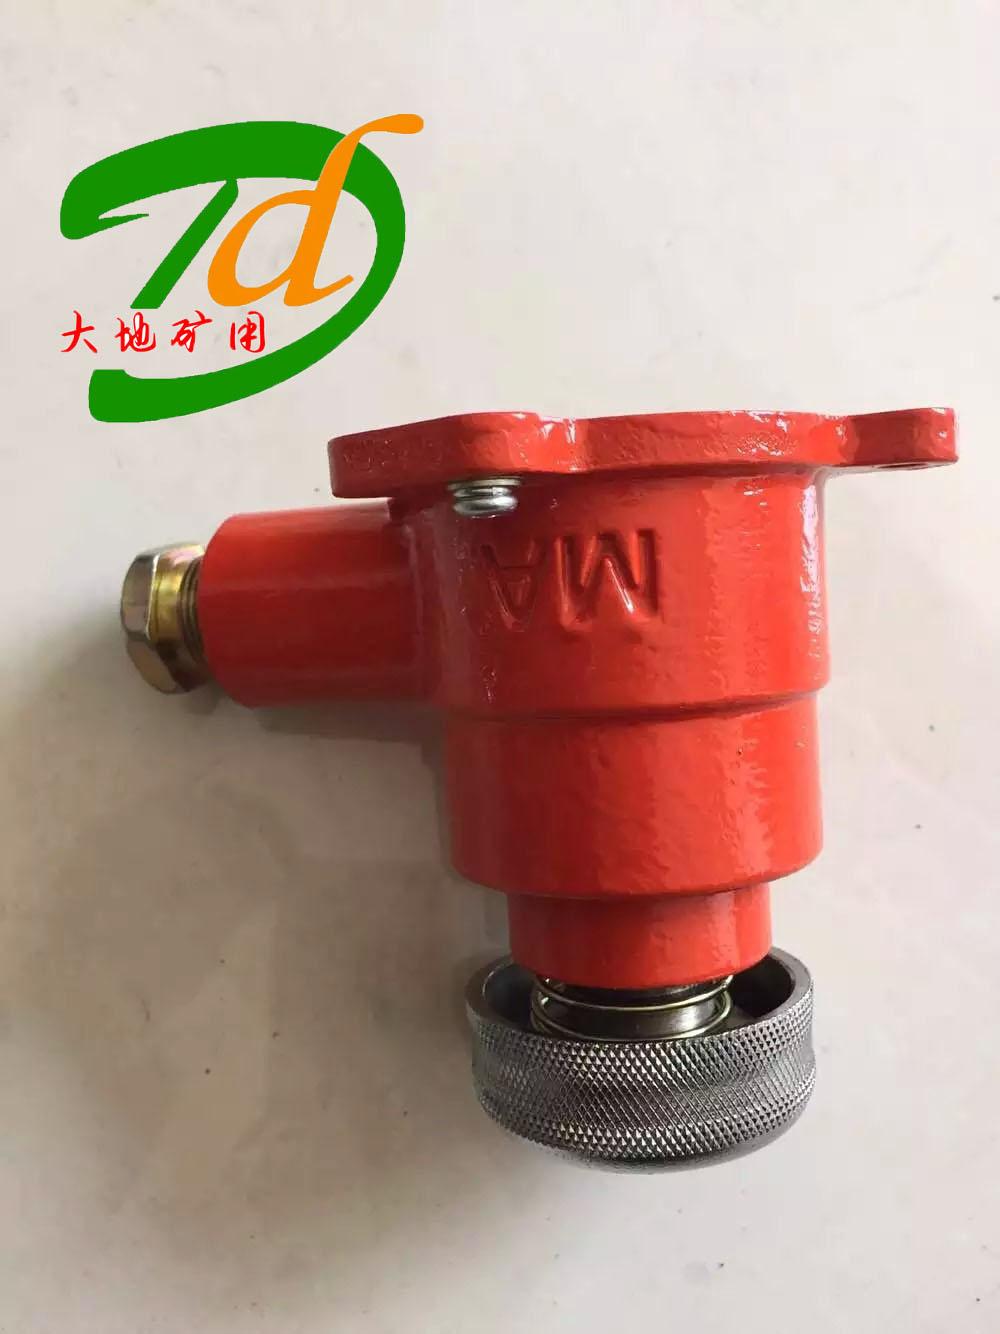 BZA02-5/36-1矿用急停按钮介绍